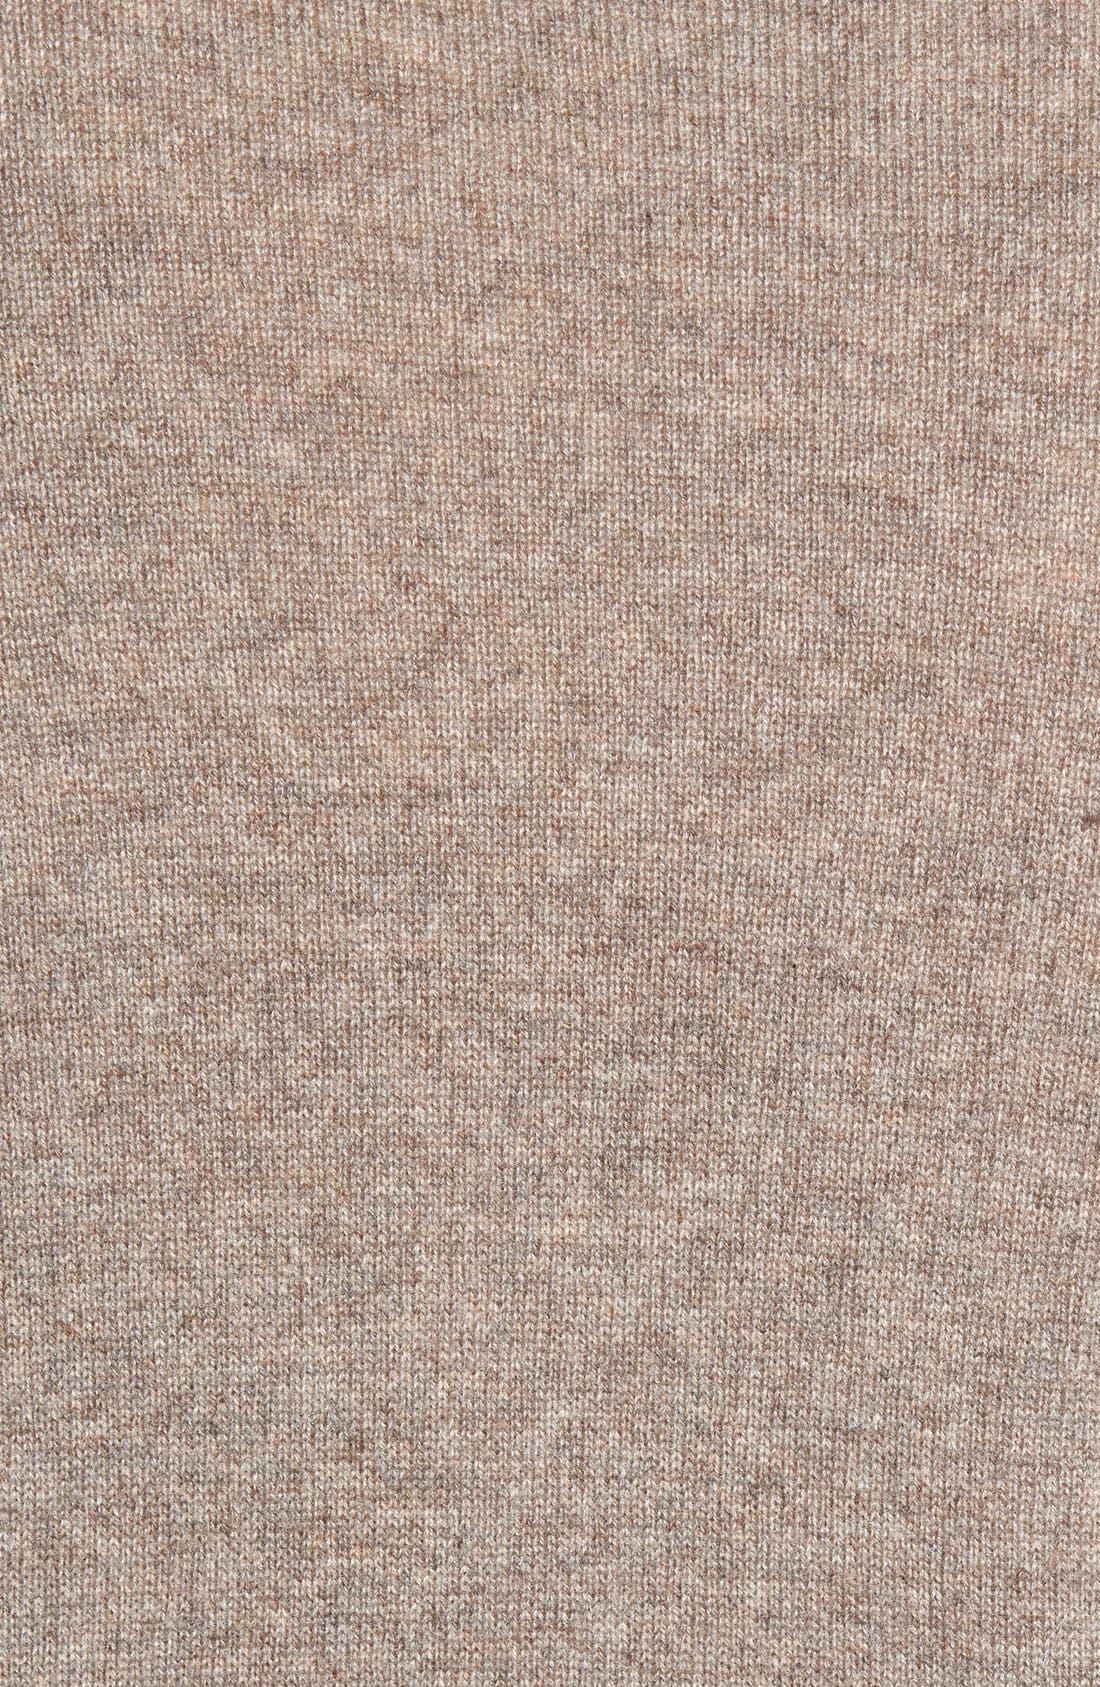 Cashmere V-Neck Sweater,                             Alternate thumbnail 10, color,